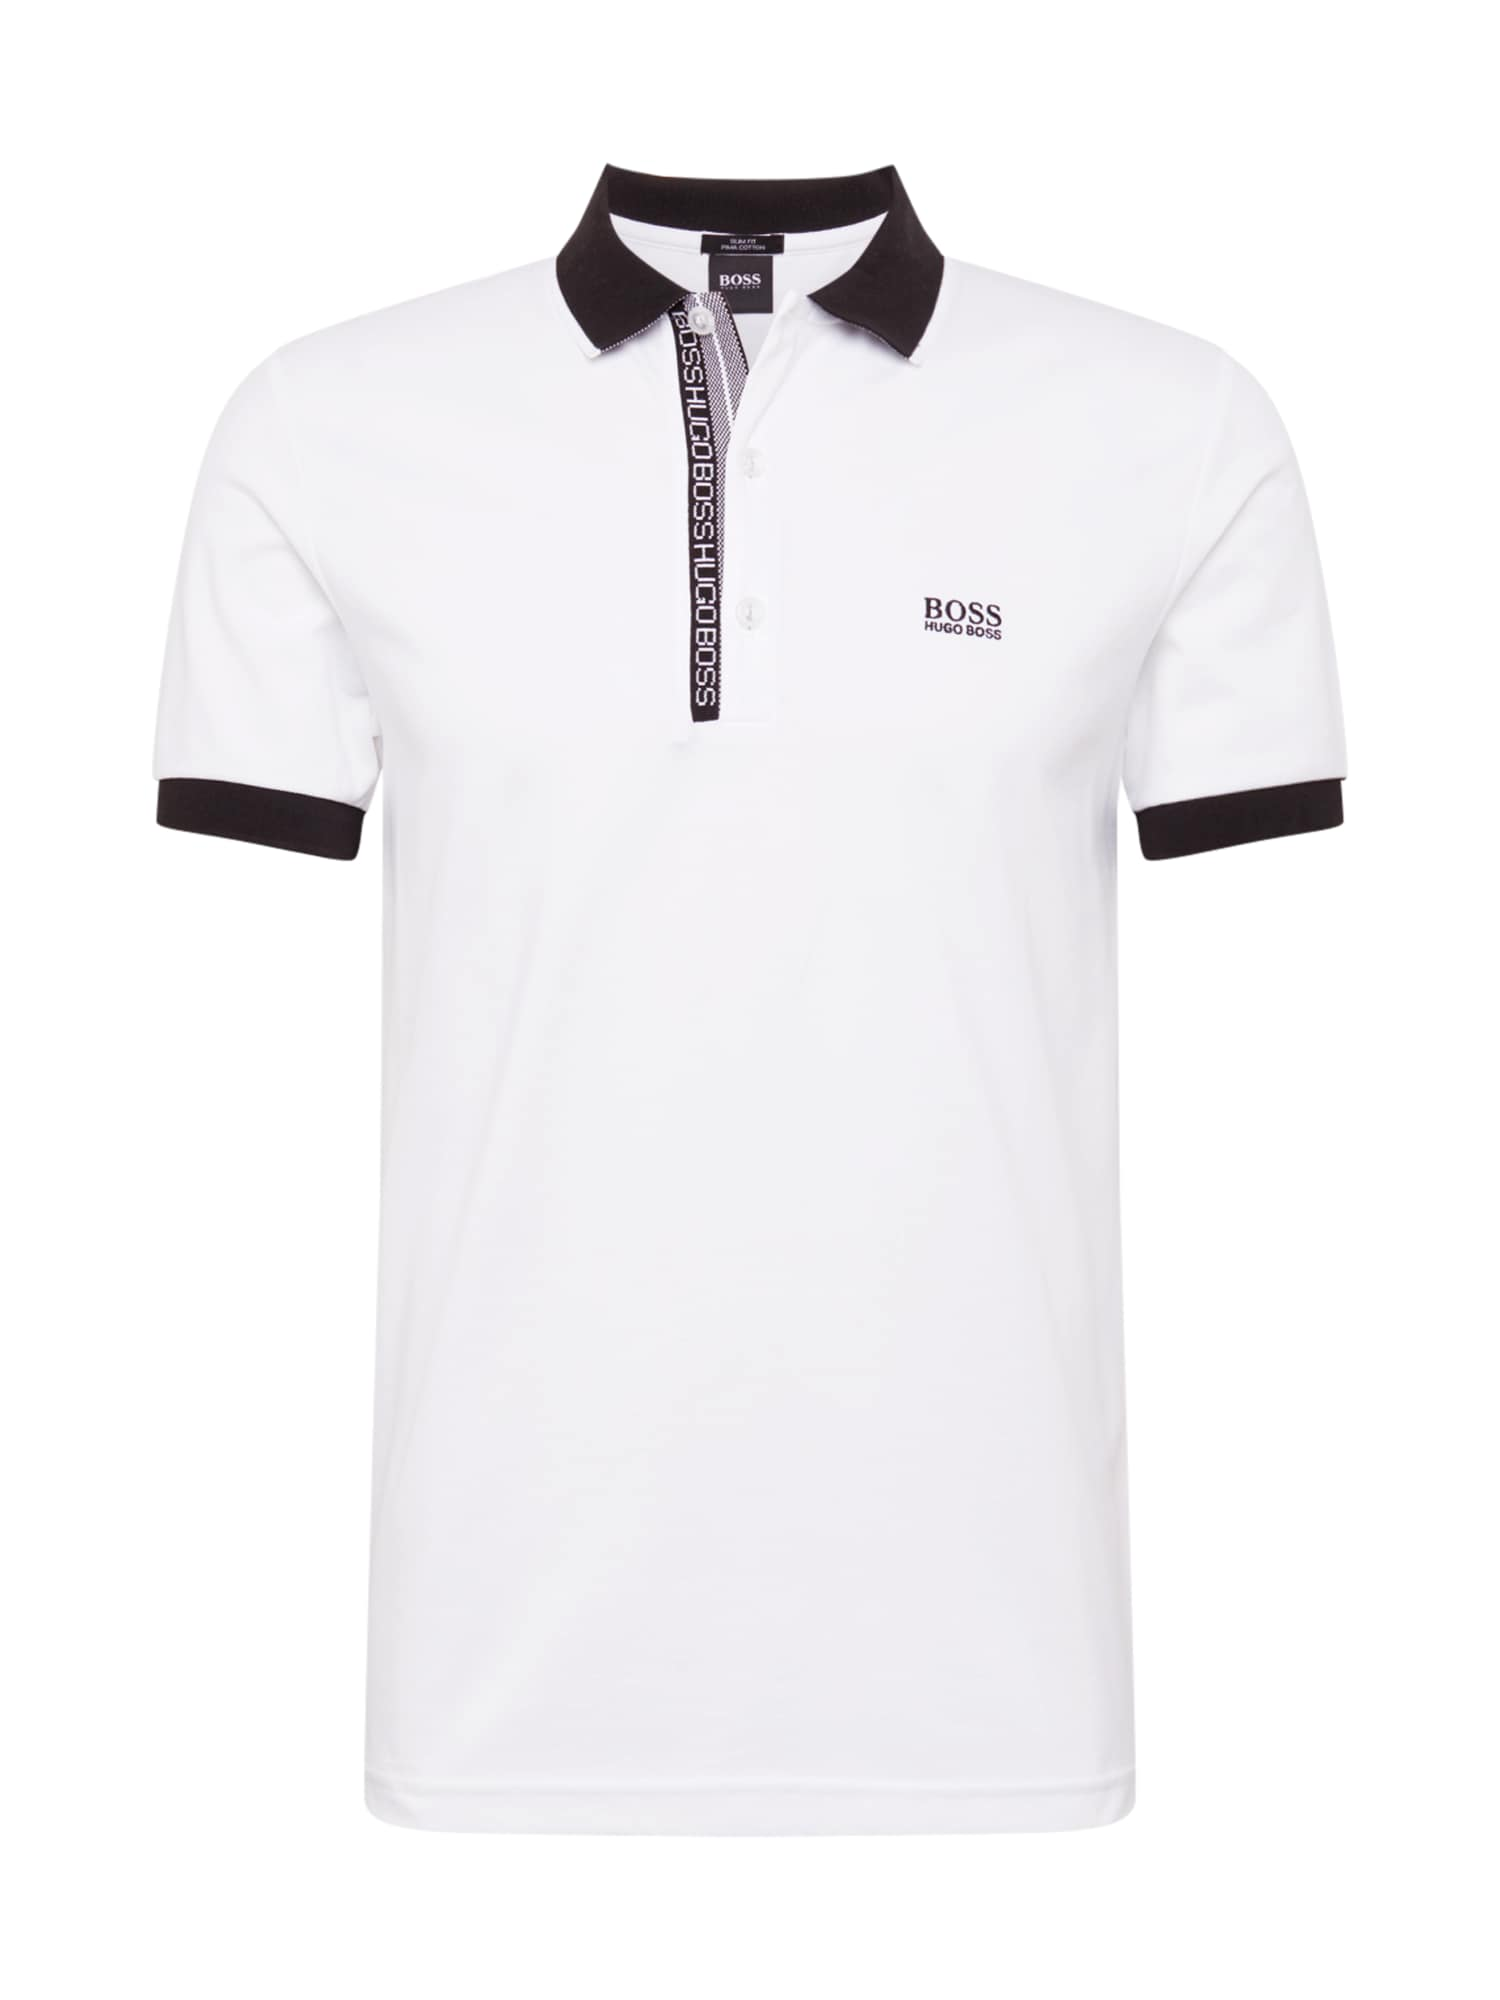 BOSS ATHLEISURE Tričko 'Paule 4'  černá / bílá